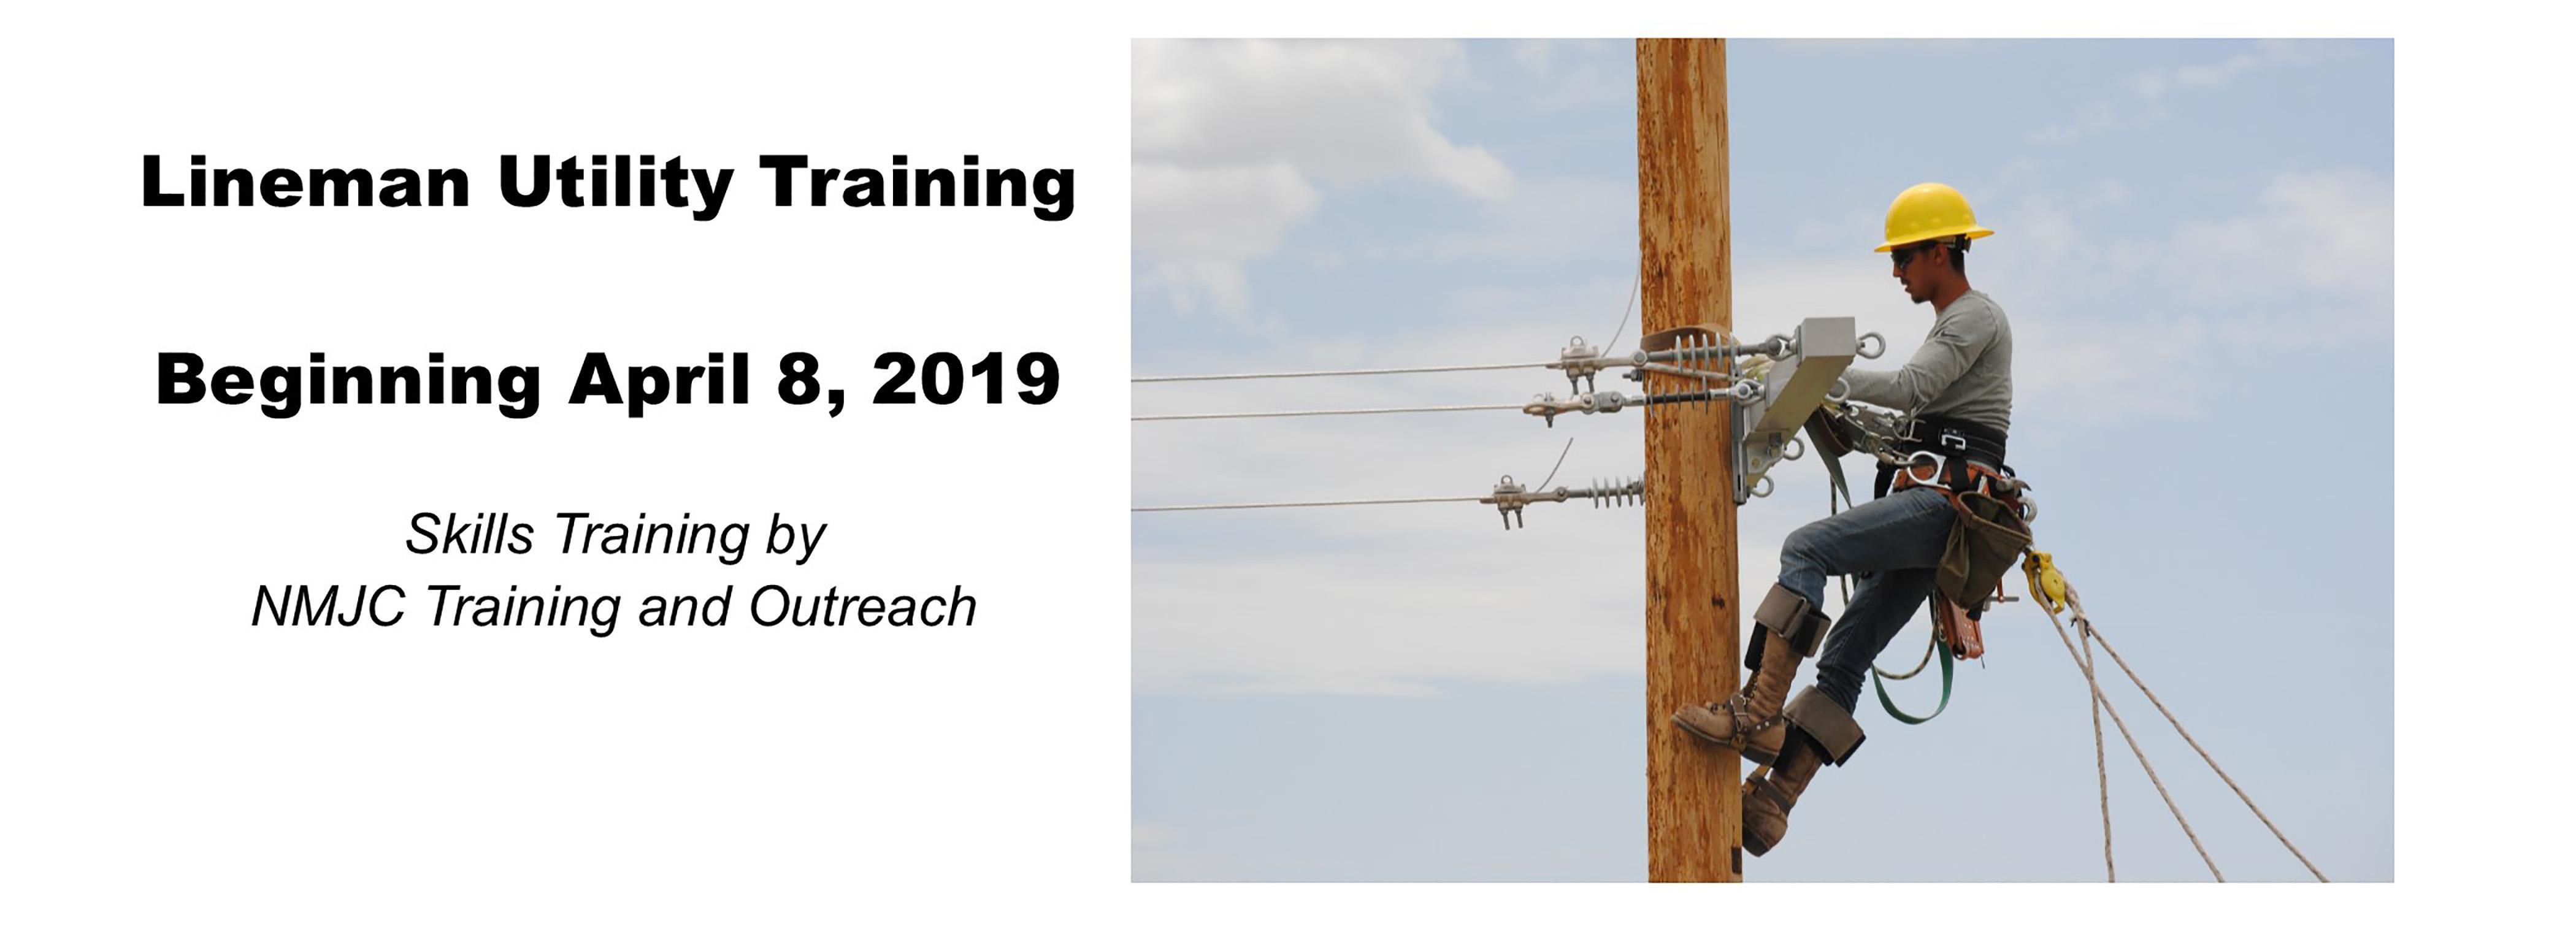 Lineman Utility Classes Start April 8